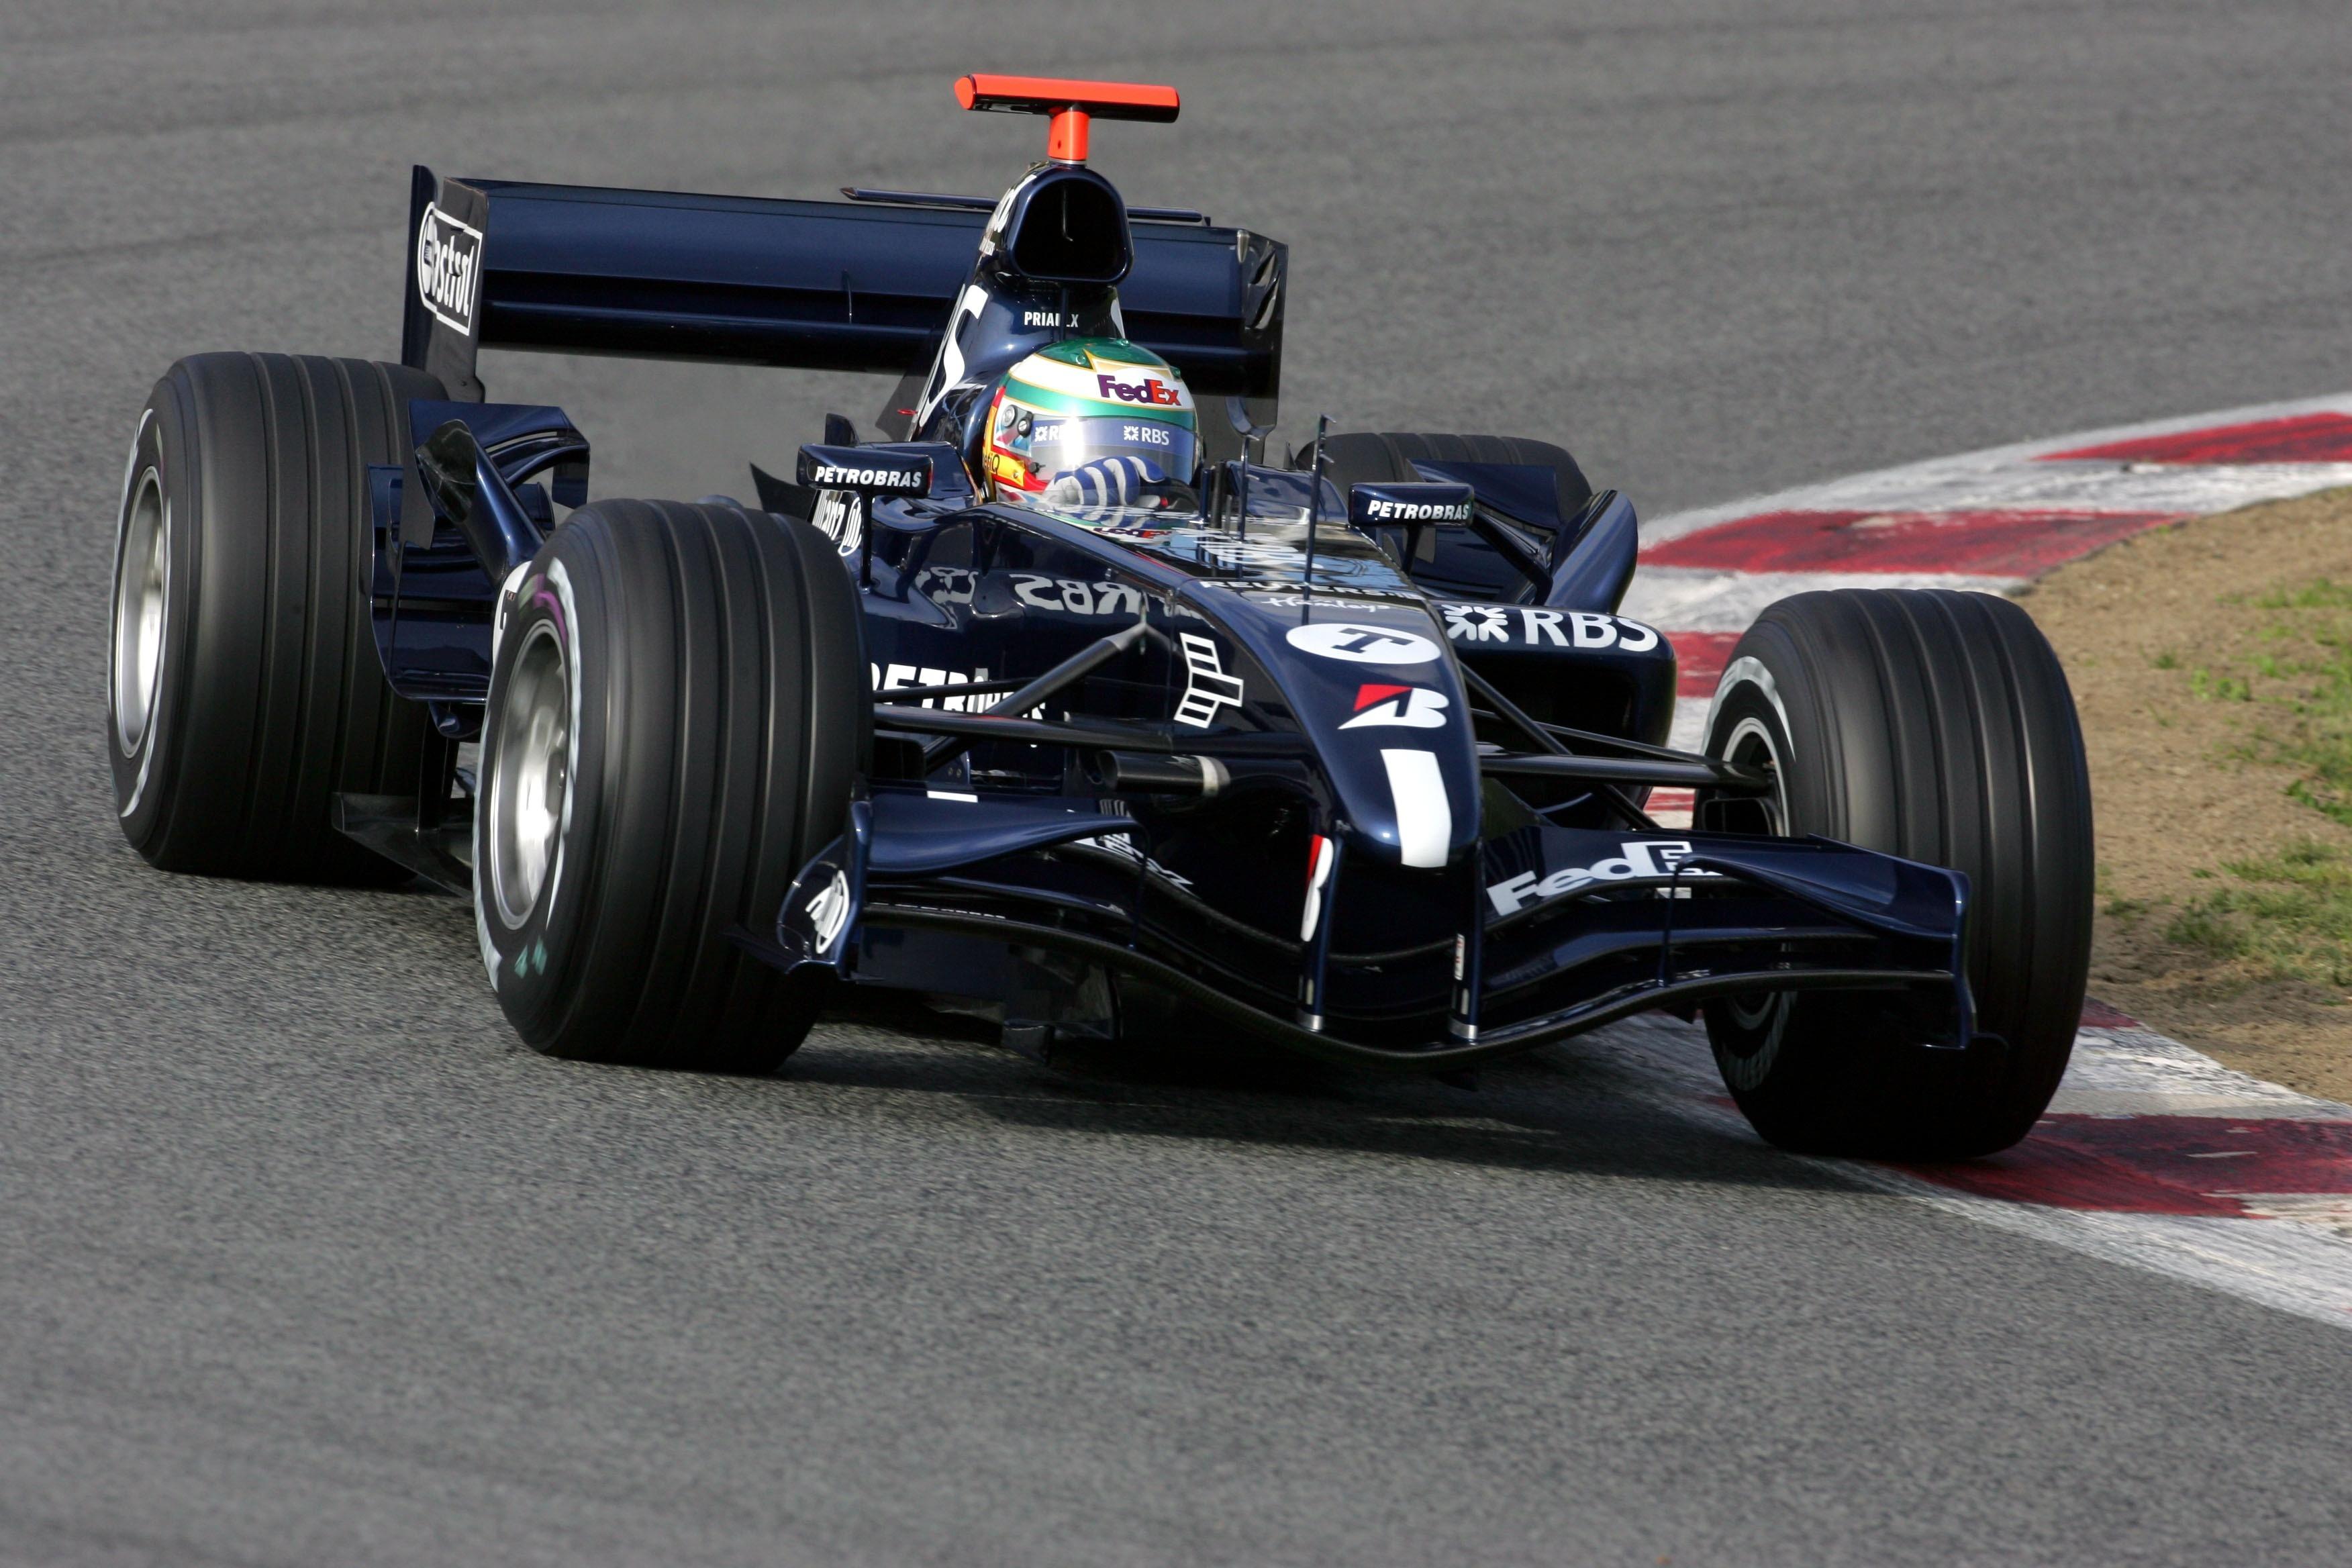 Andy Priaulx Williams F1 test 2005 Barcelona